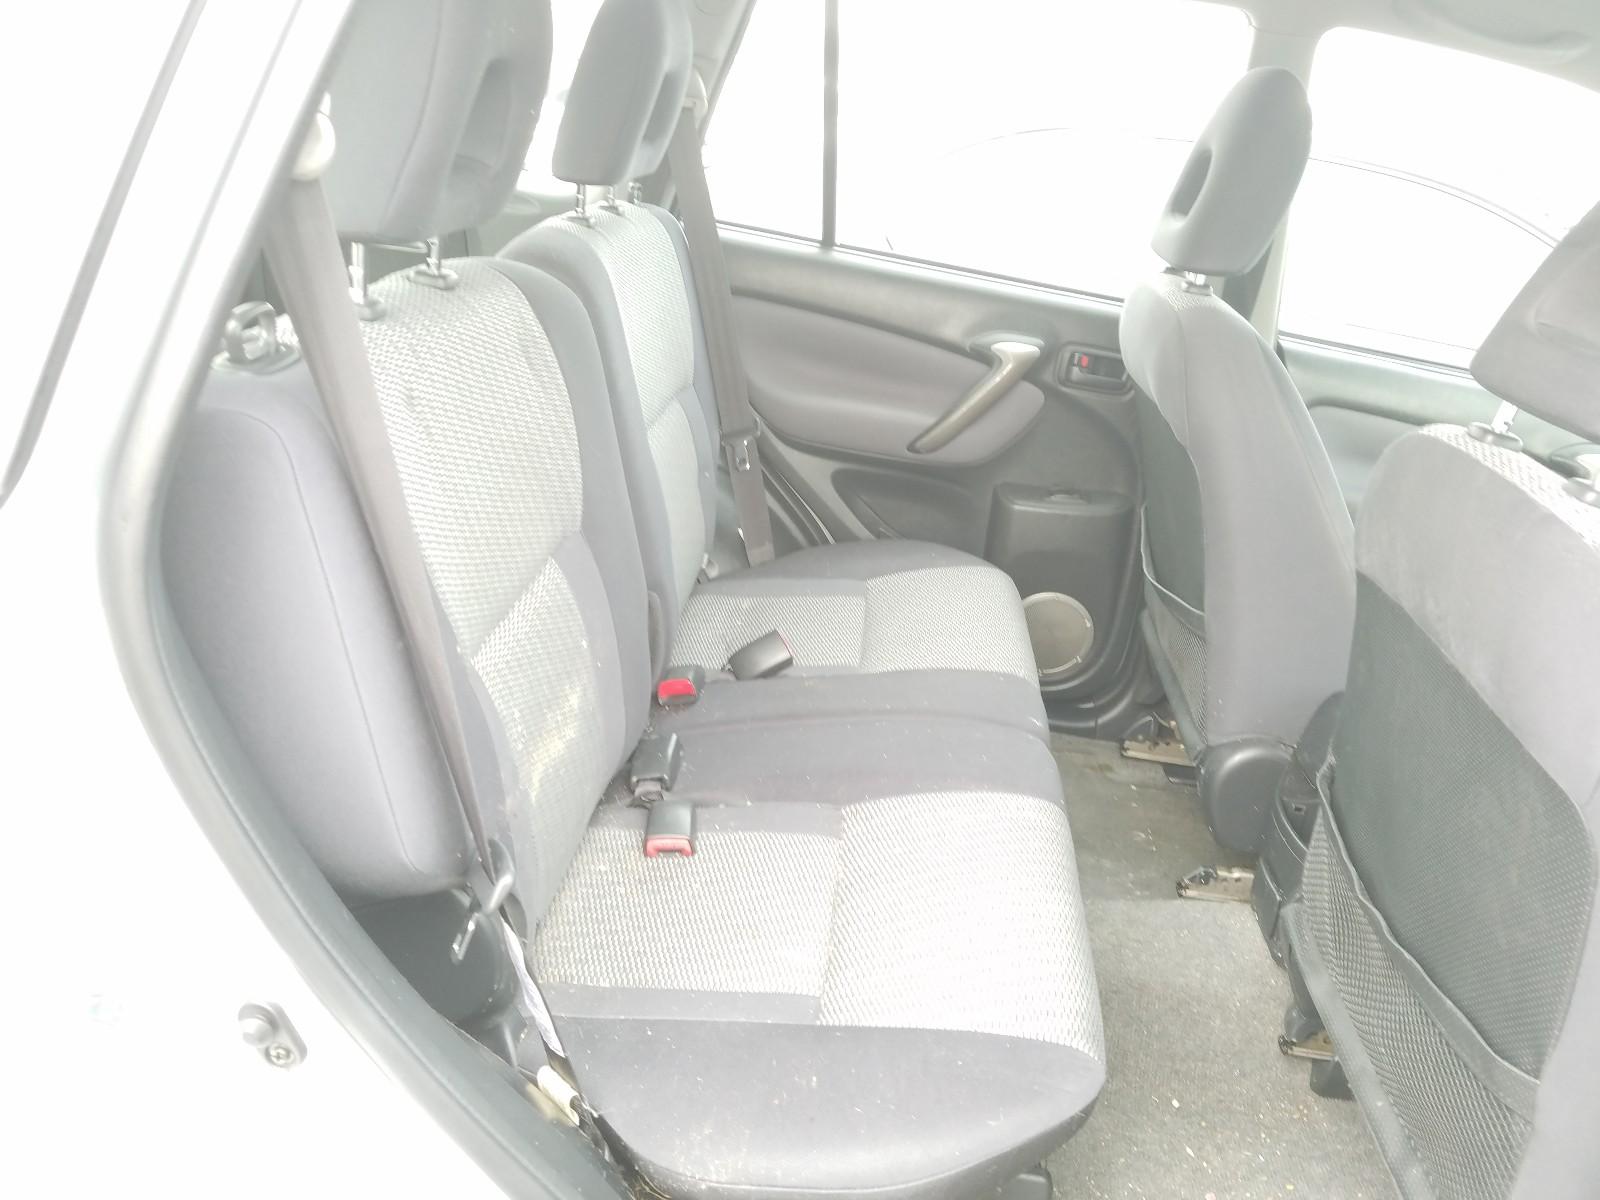 JTEGD20V740042385 - 2004 Toyota Rav4 2.4L detail view